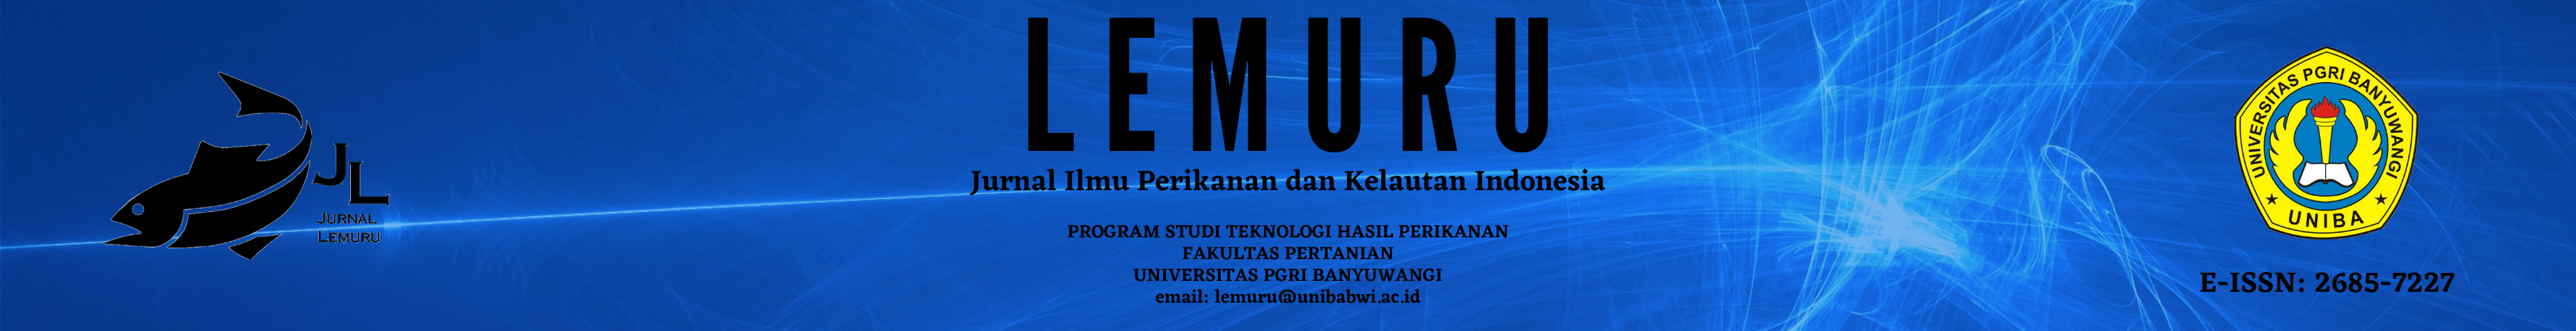 https://ejournal.unibabwi.ac.id/index.php/lemuru/index